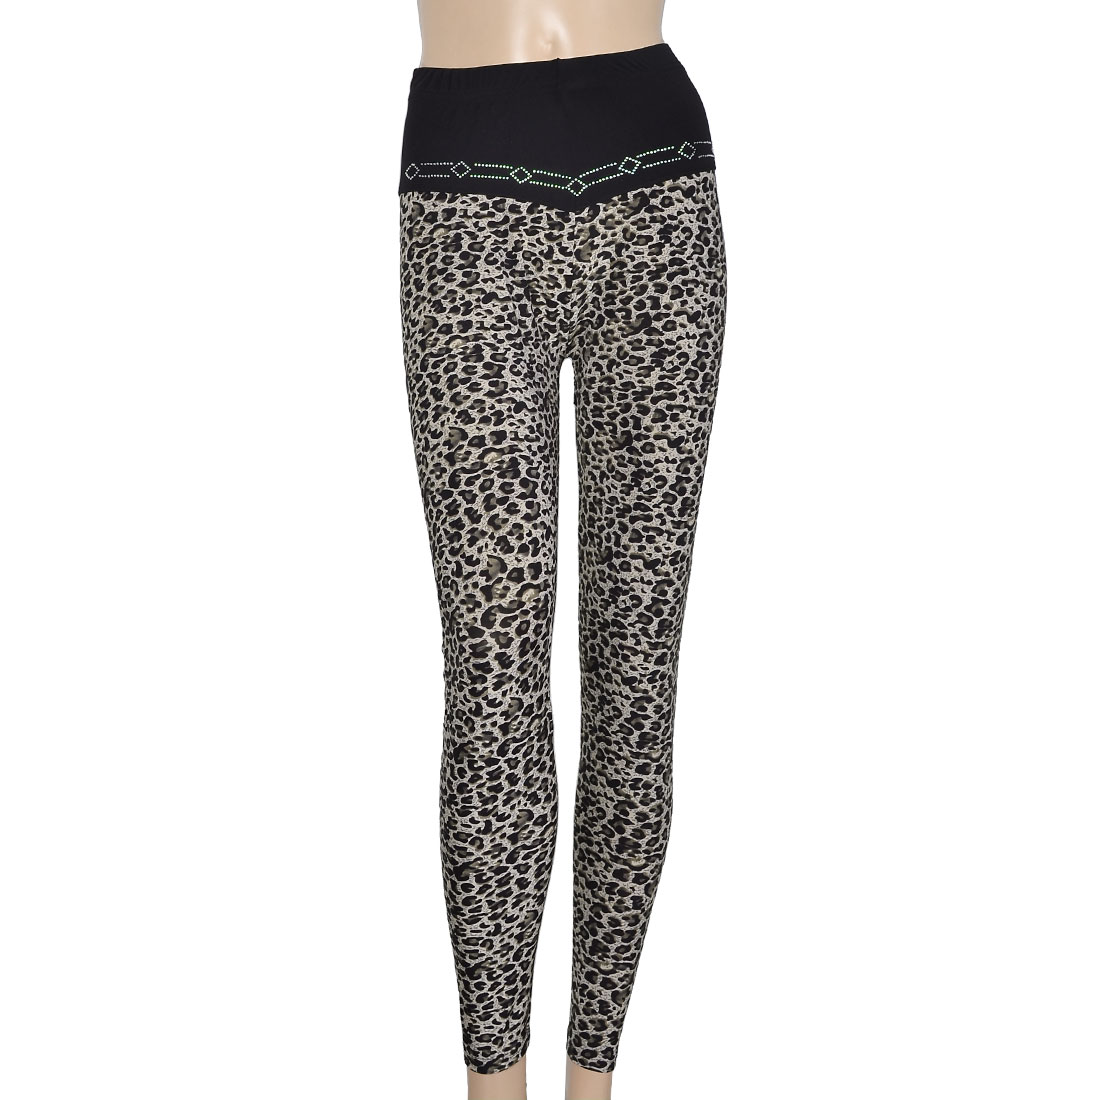 Women Faux Crystal Decor Elastic Waist Leggings Skinny Pants Black XS